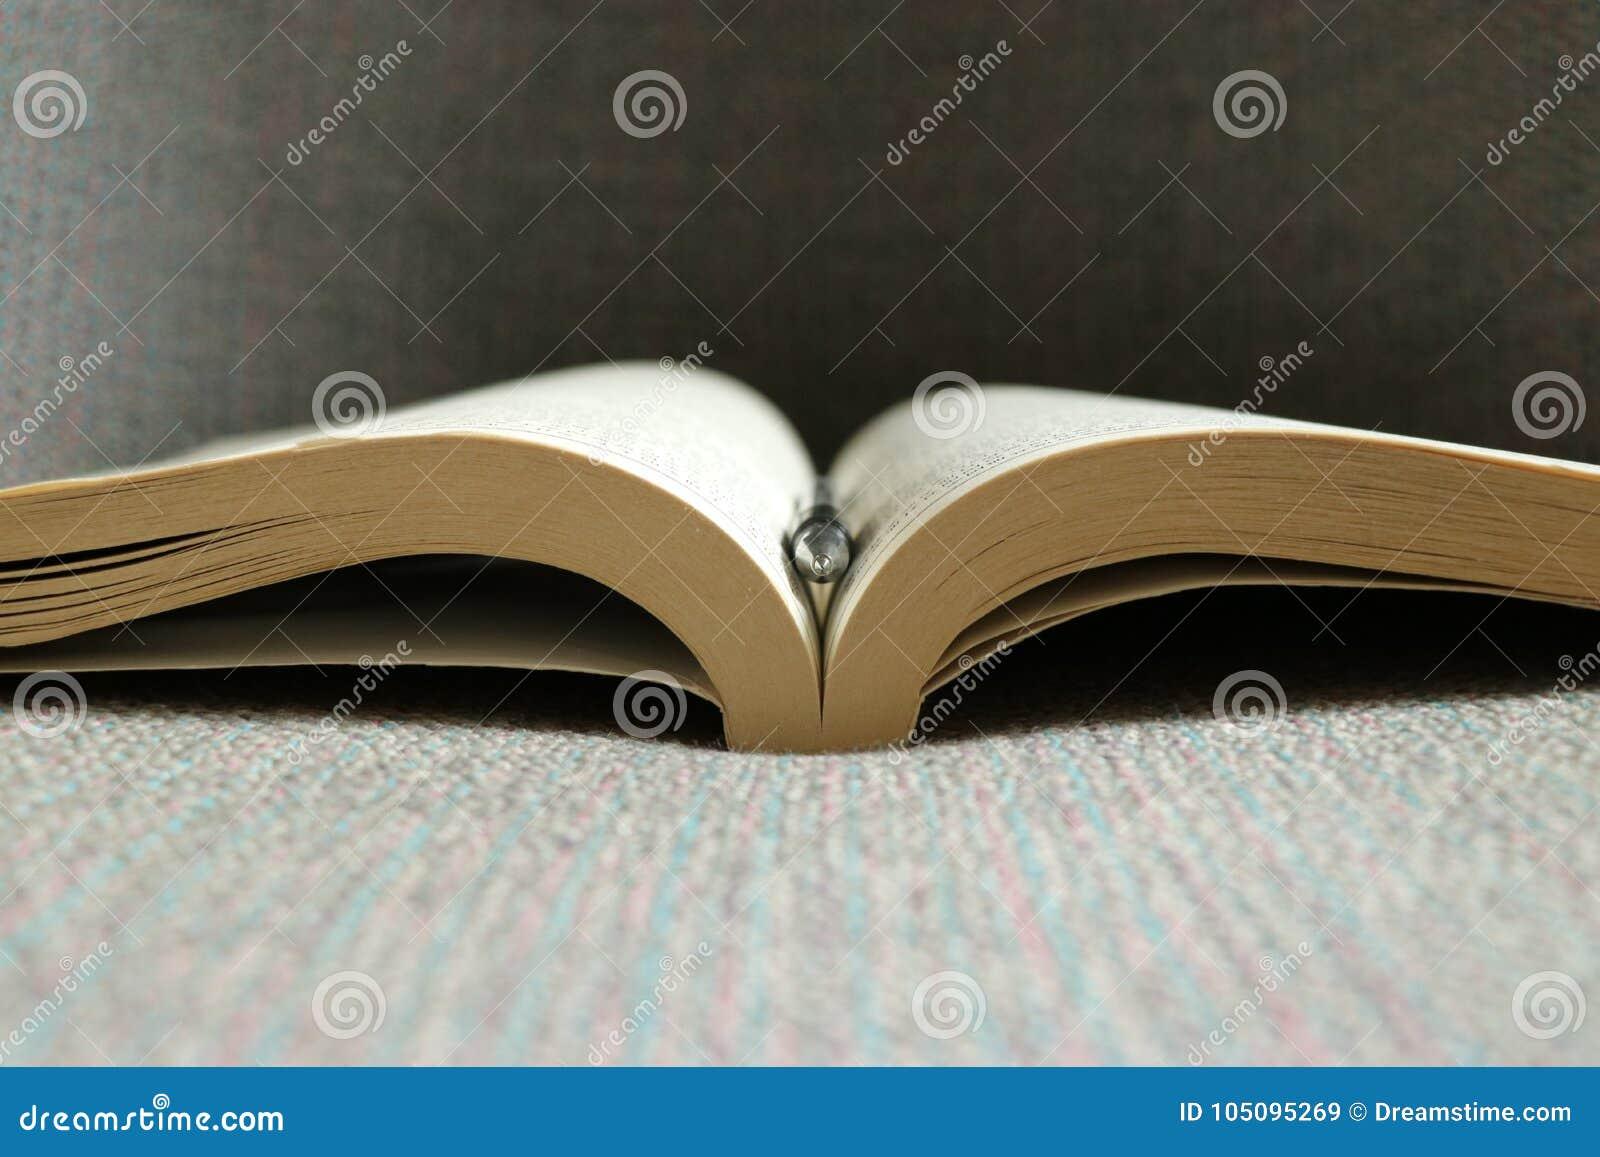 An open book and a pen